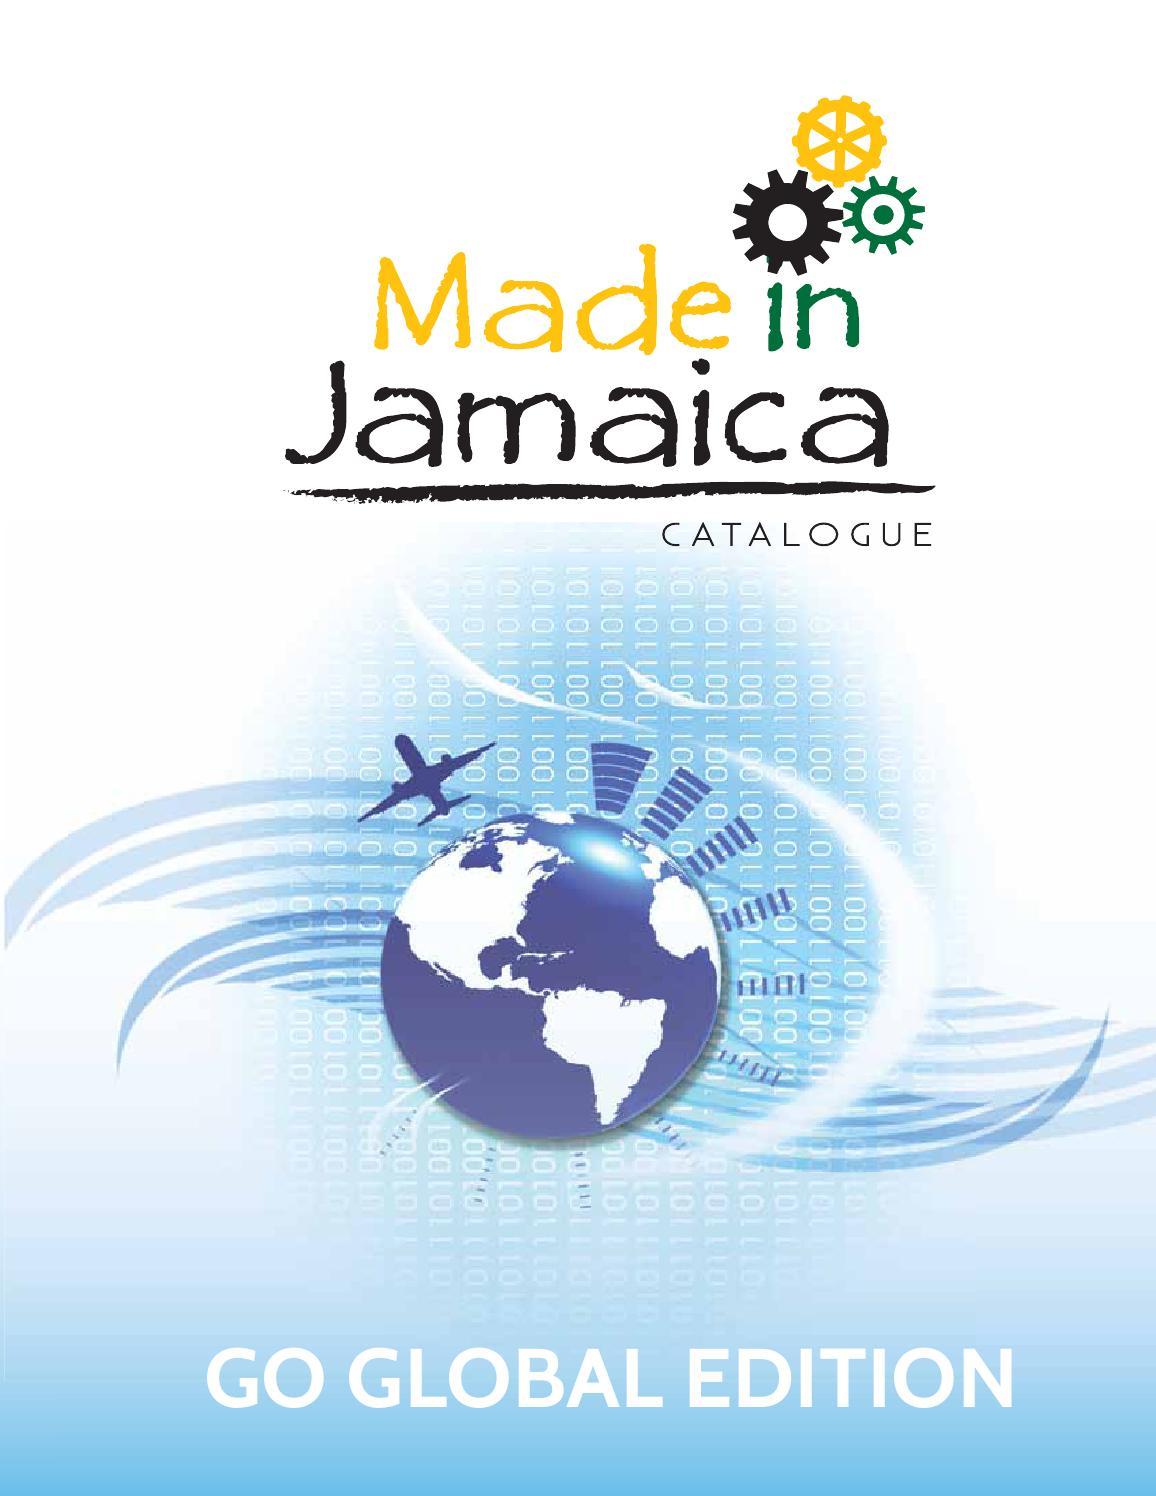 Made in Jamaica Catalogue GO GLOBAL by Deika Morrison - issuu